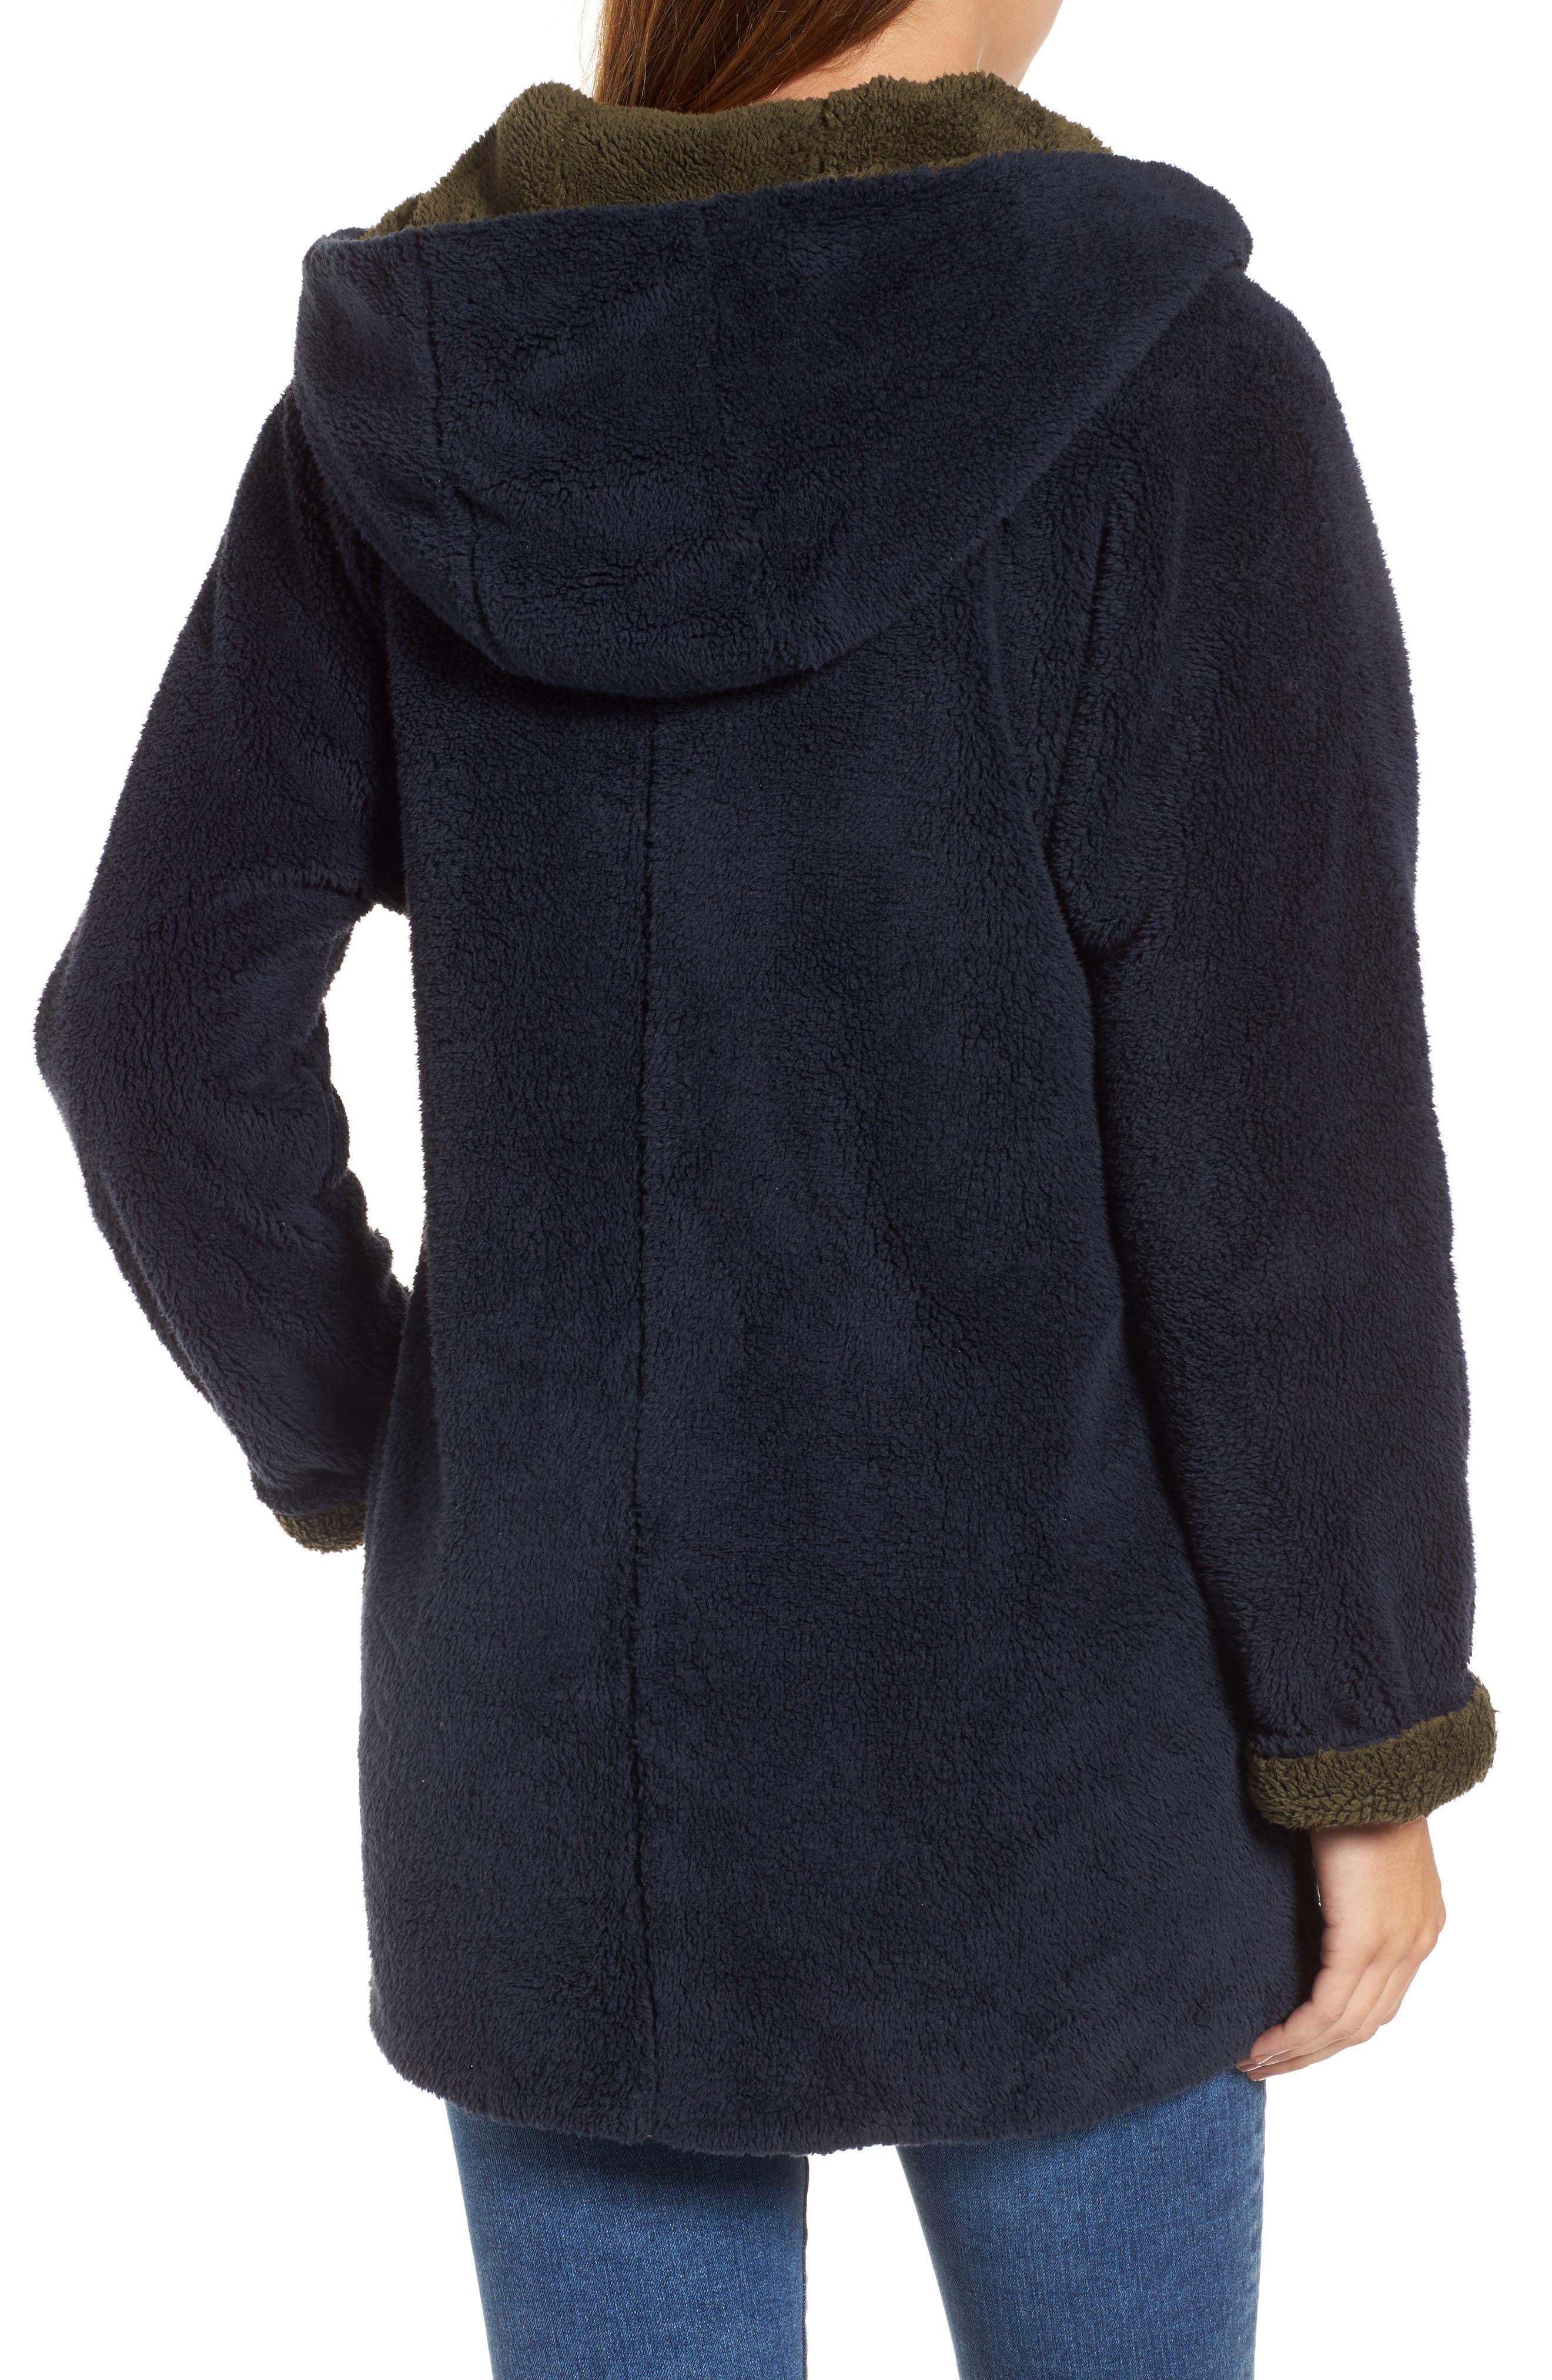 Hooded Reversible Coat,                             Alternate thumbnail 2, color,                             Navy/ Olive